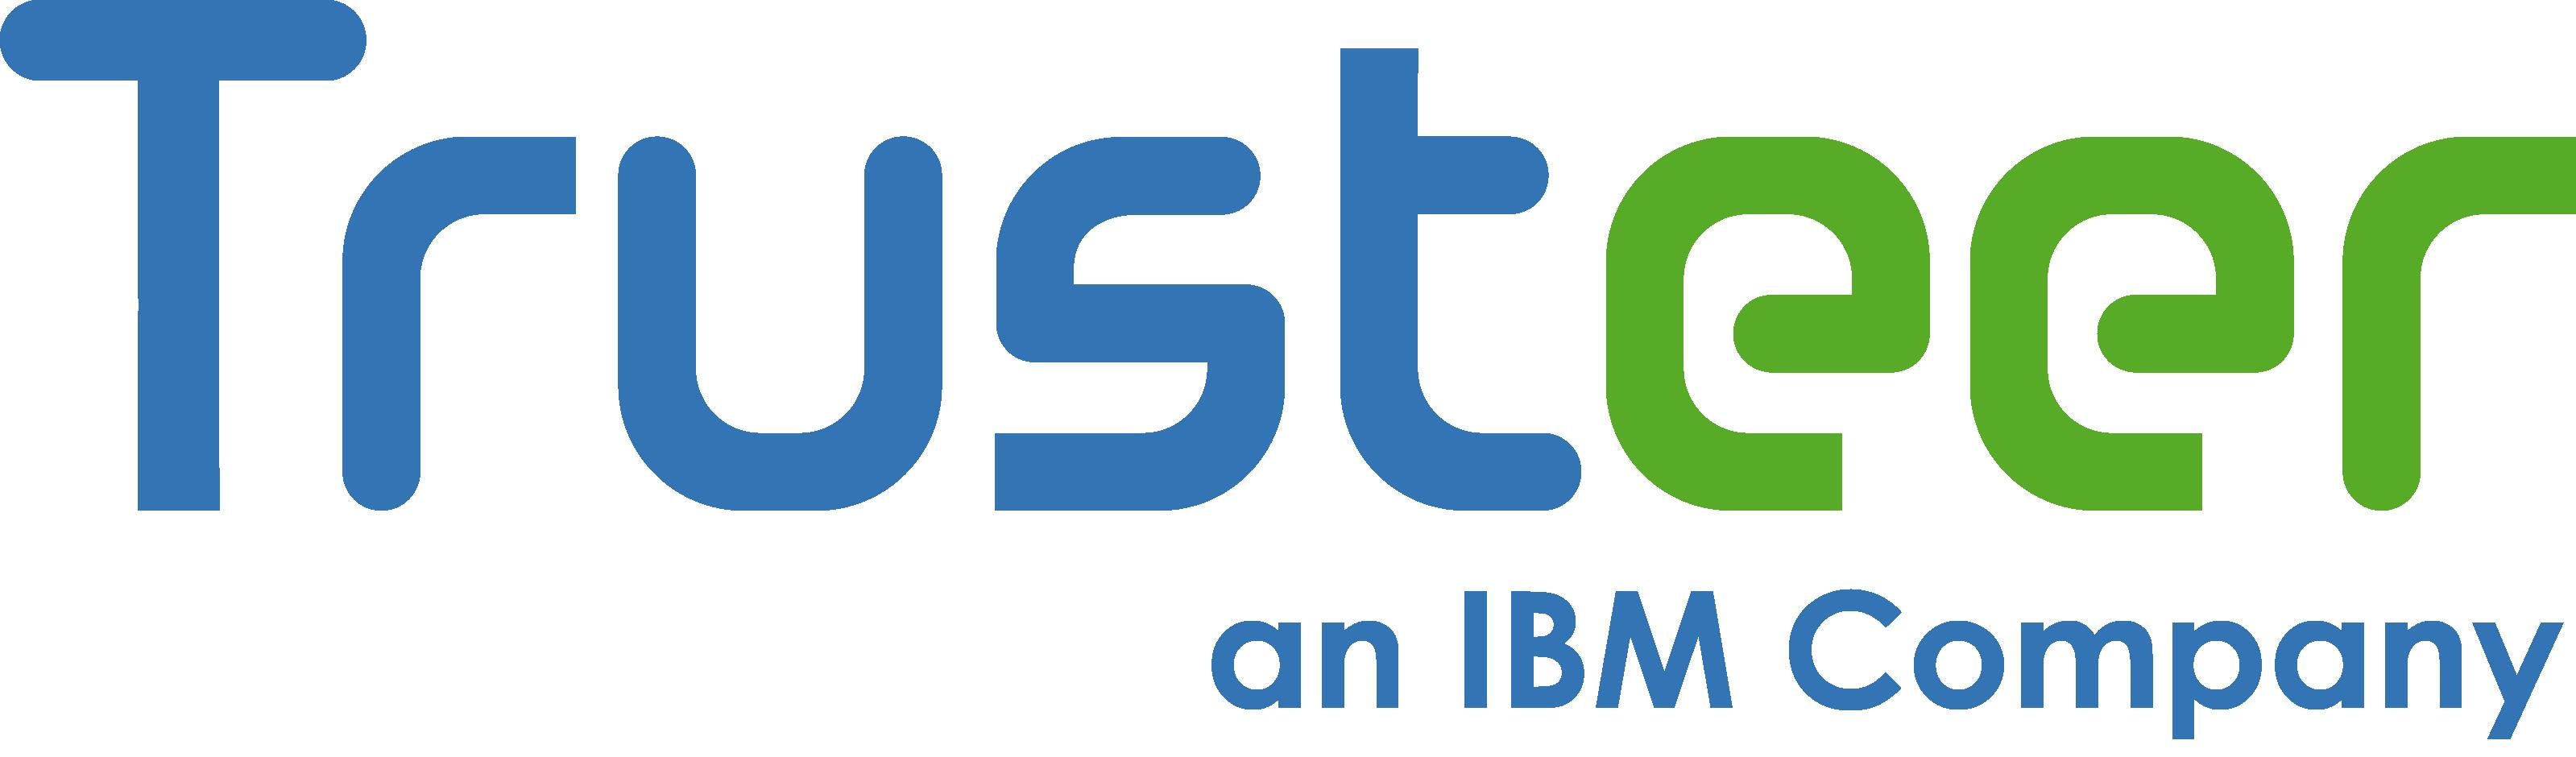 File:Trusteer anIBMcompany Logo.png - Wikipedia, the free encyclopedia